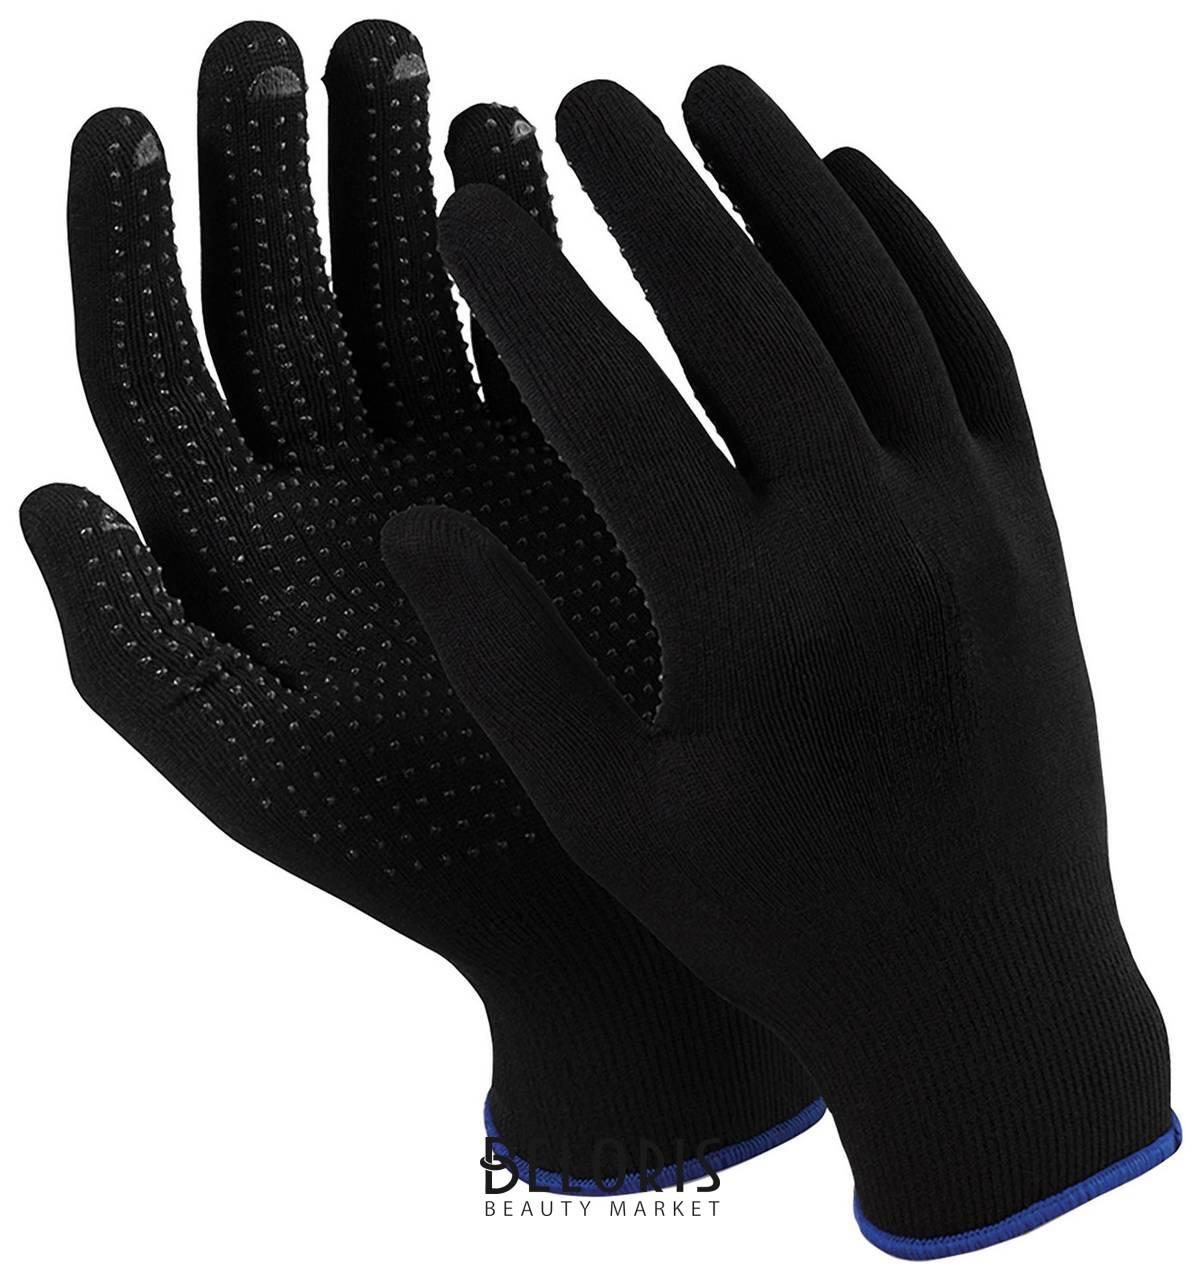 Перчатки MANIPULA Микрон Блэк ПВХ, ПВХ-точка, комплект 10 пар, размер 10 (XL), черные Manipula